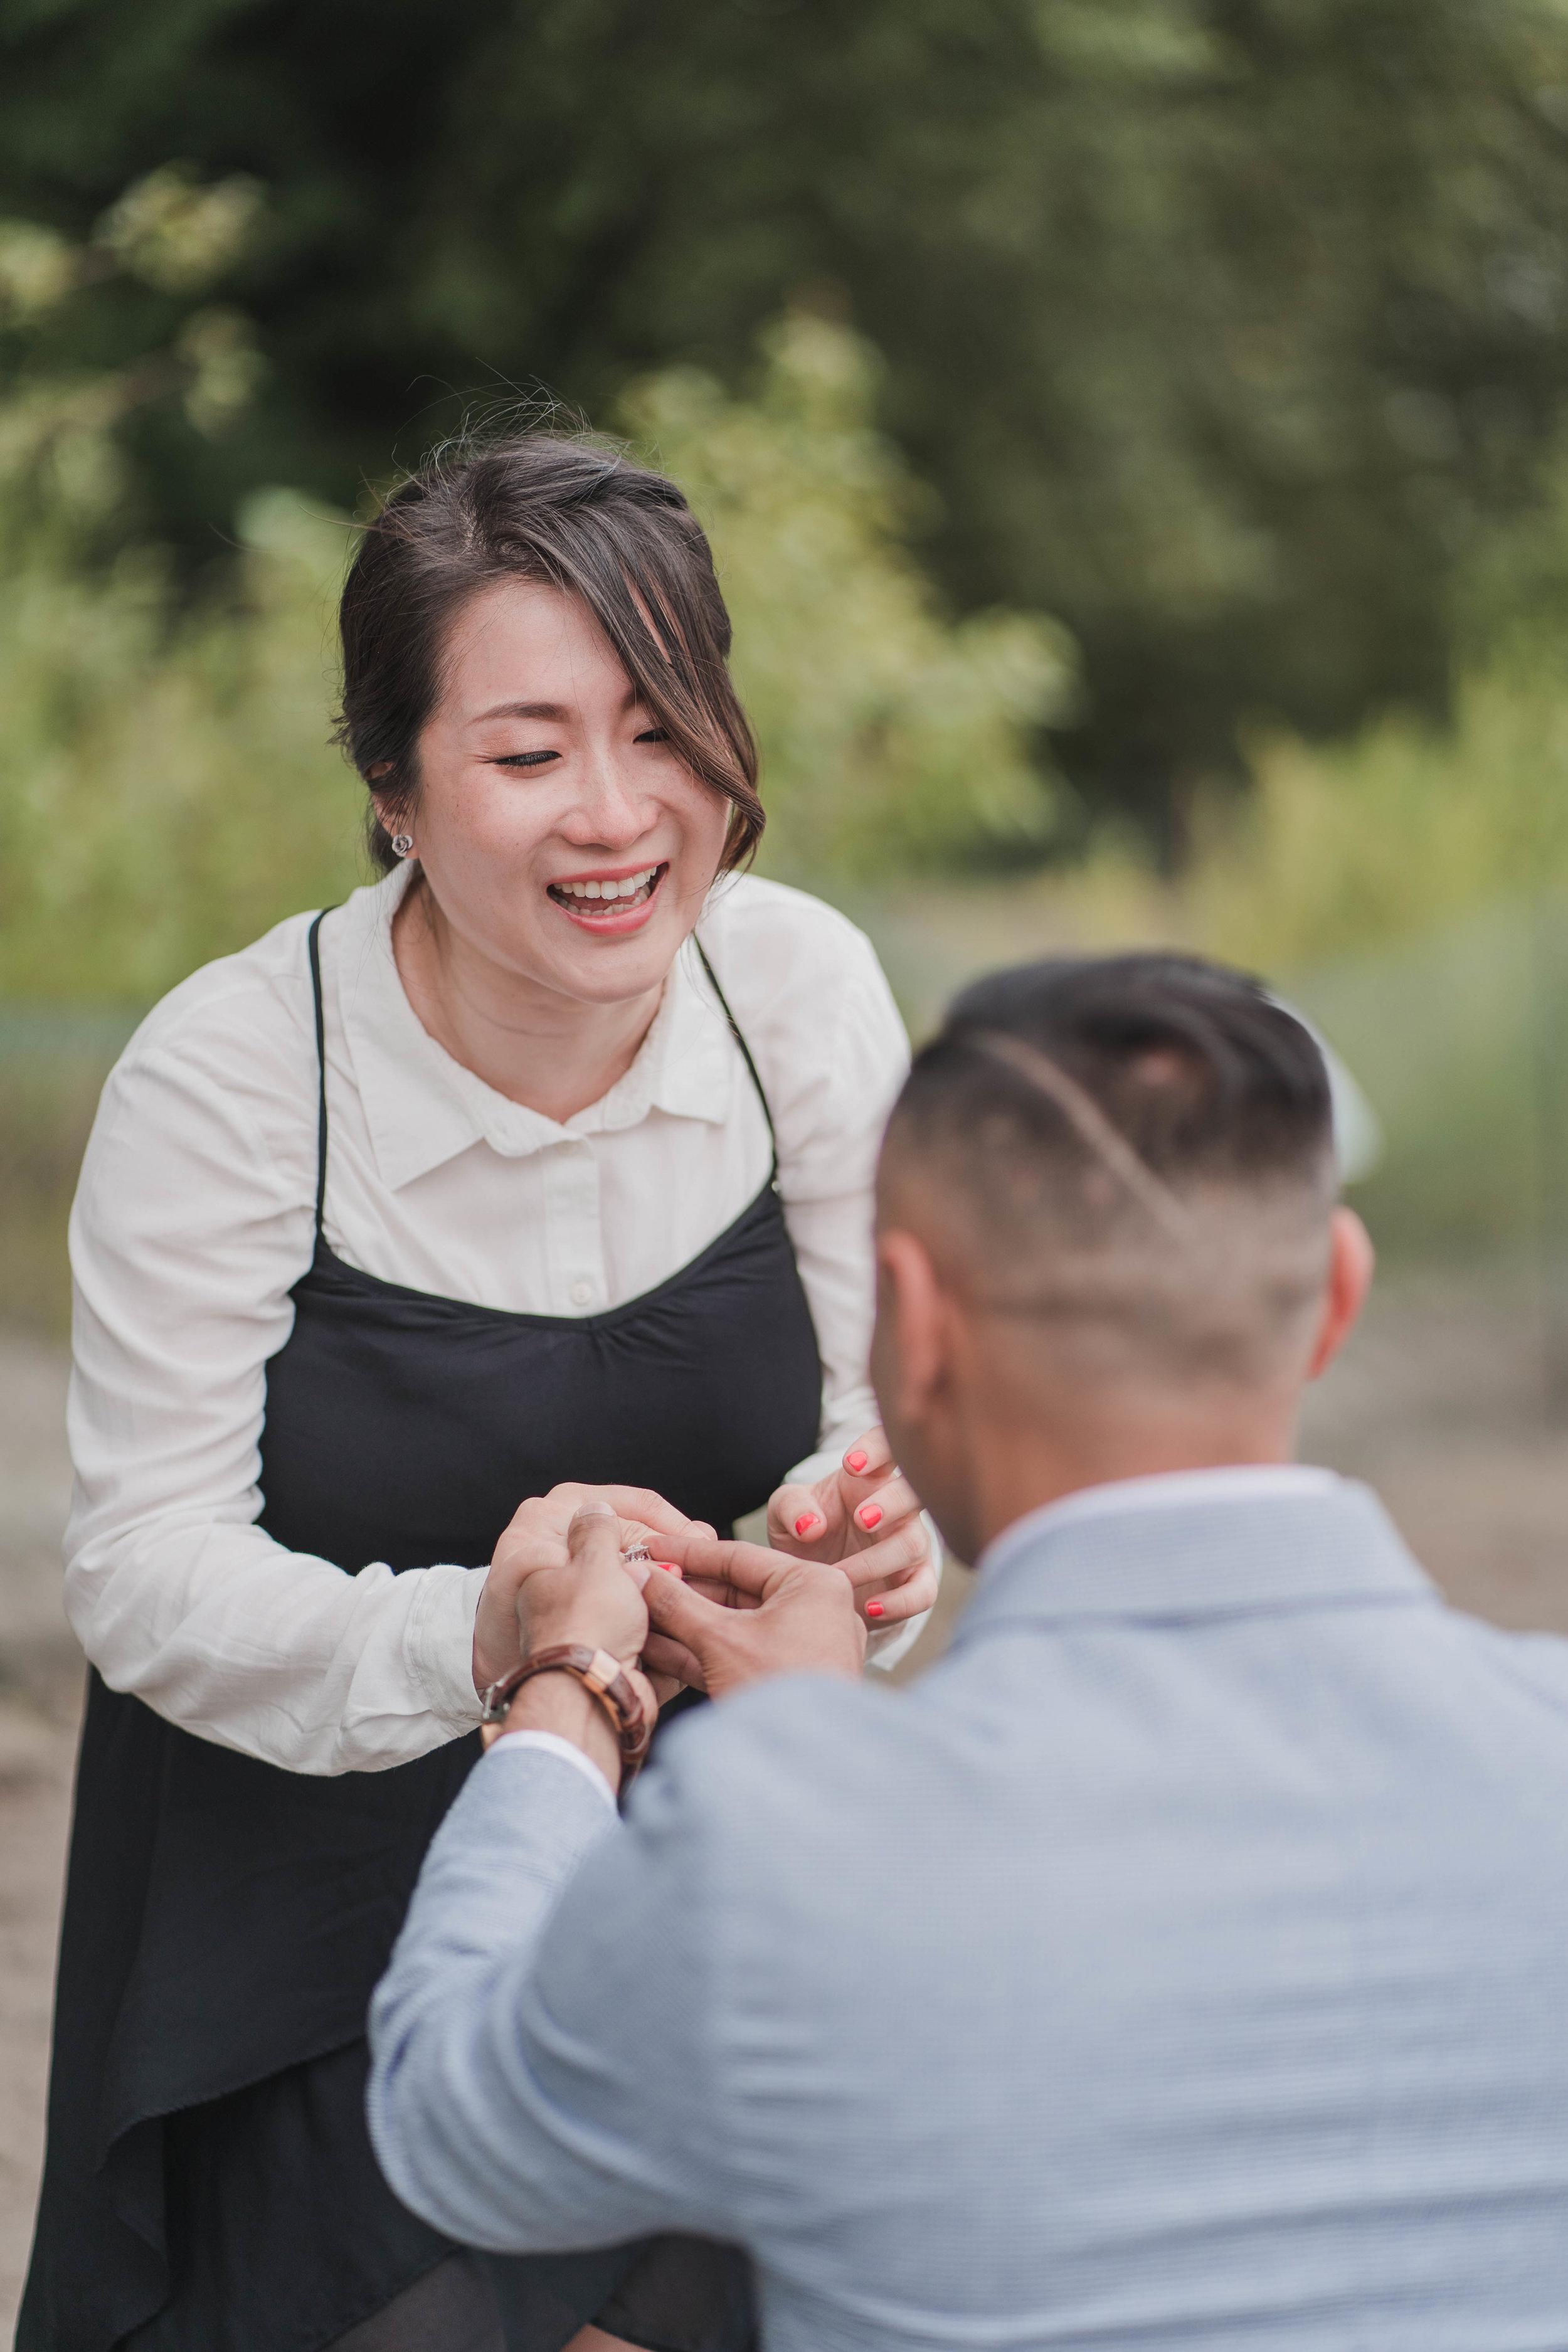 20190622 - Monika & Johnson Engagement - 0139.jpg